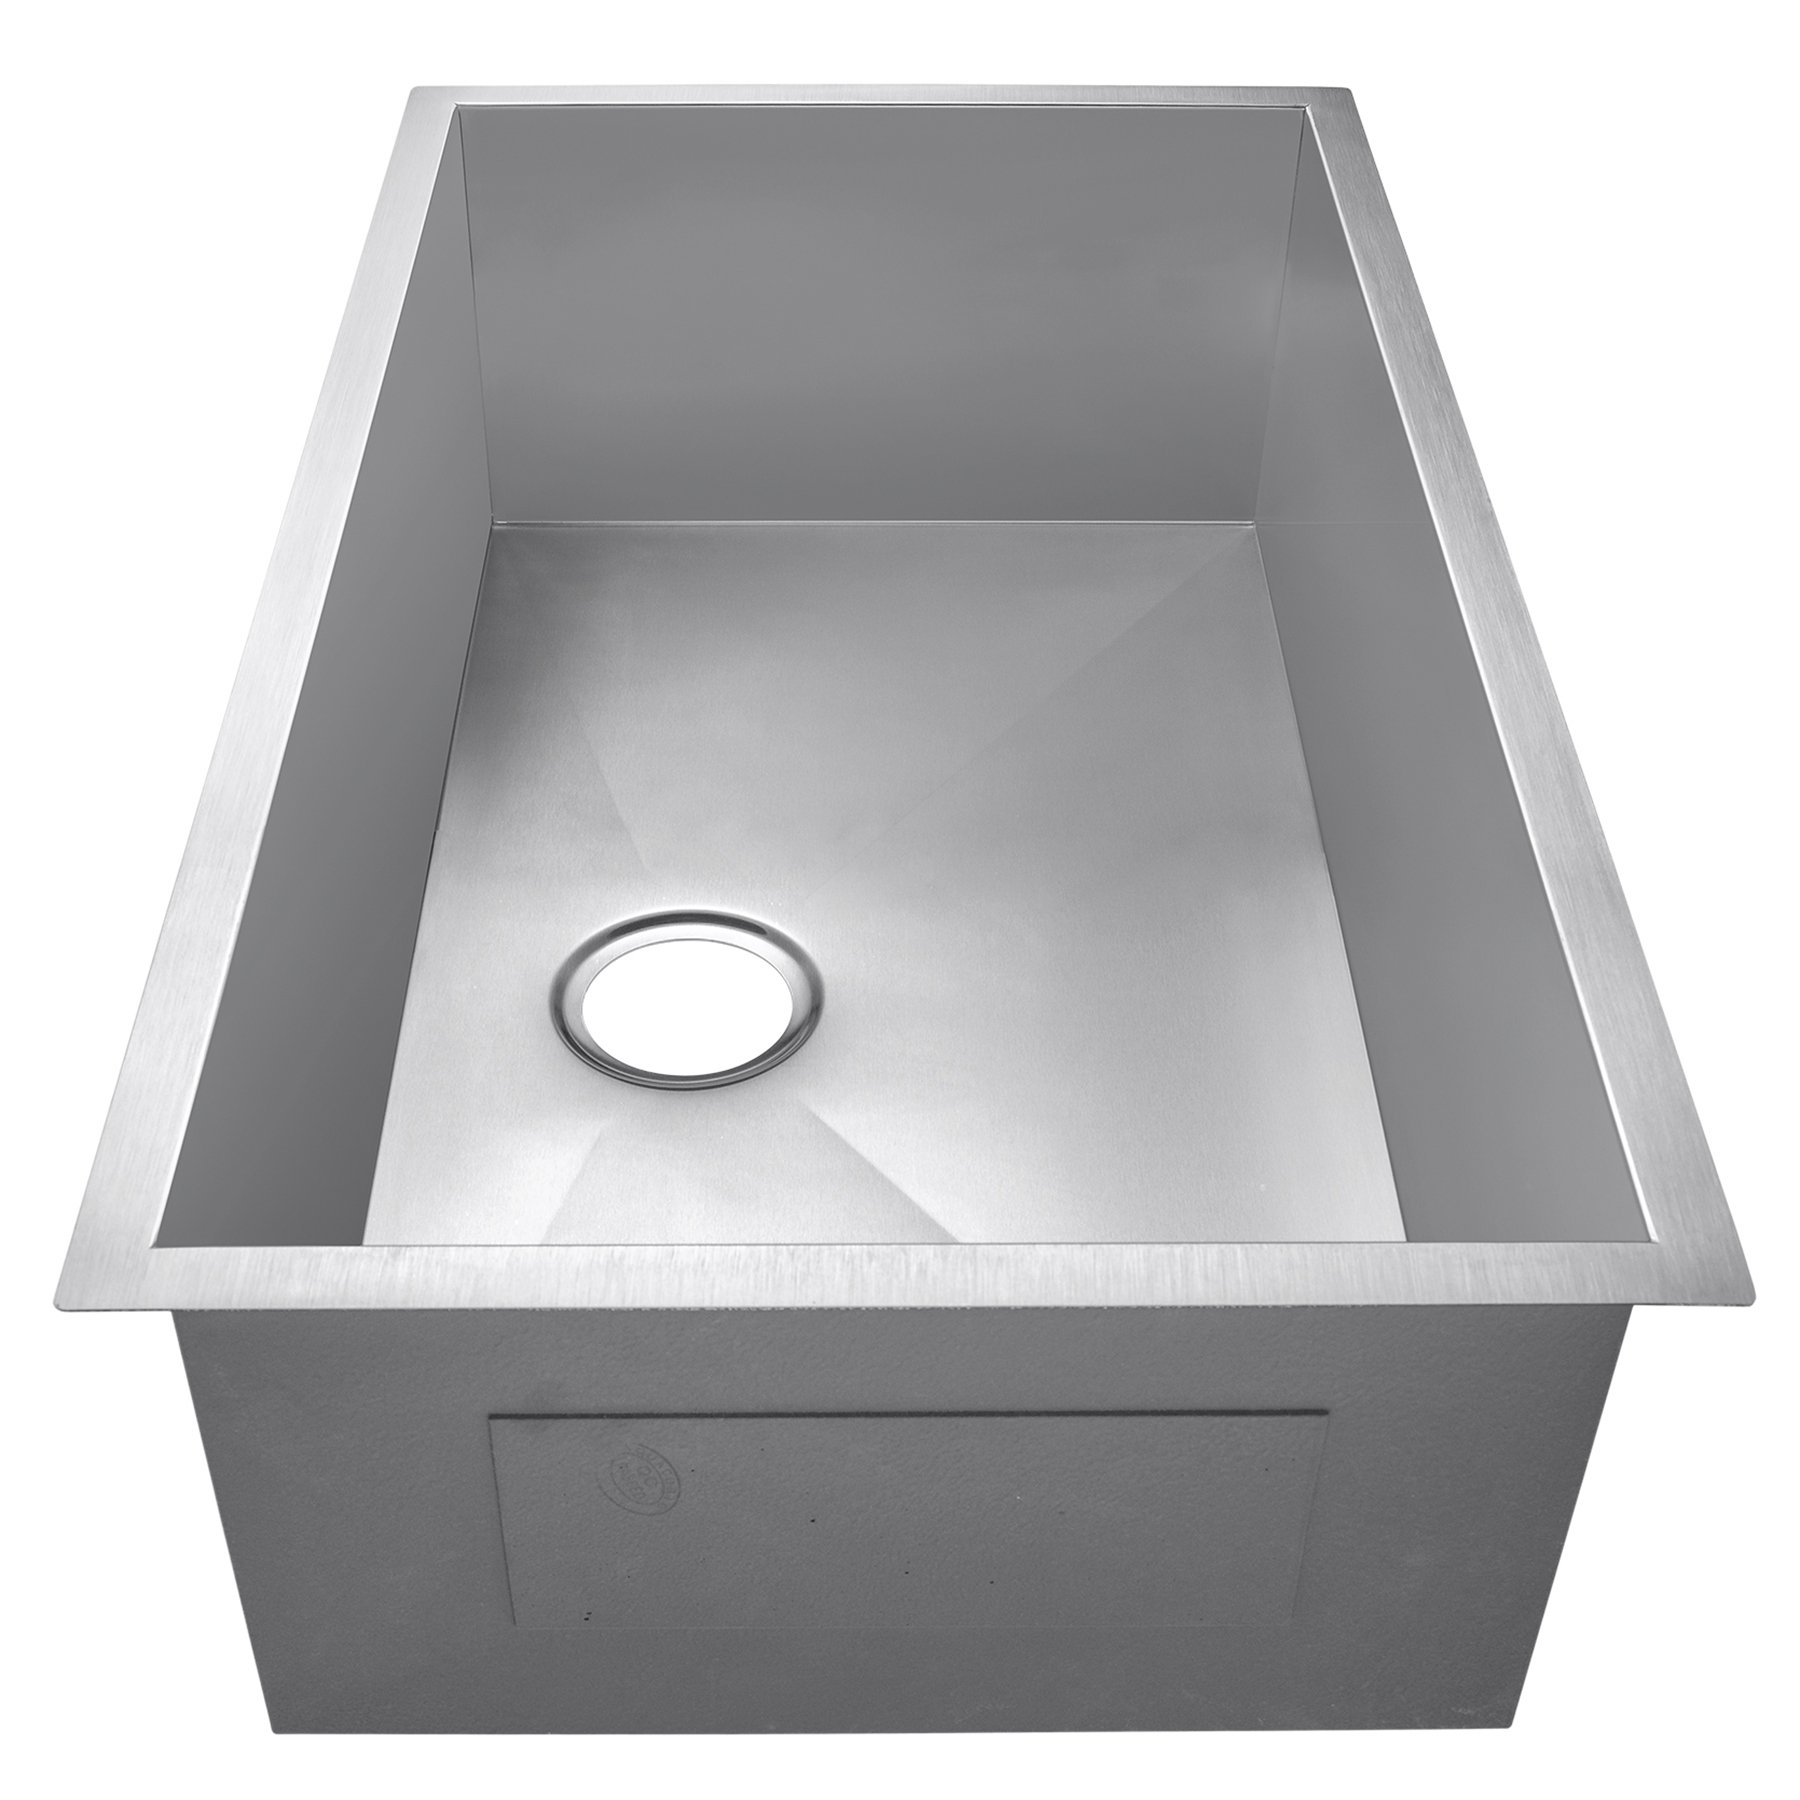 Large Sink Kitchen: Farm Sink Under Kitchen Counter Mount Large Stainless